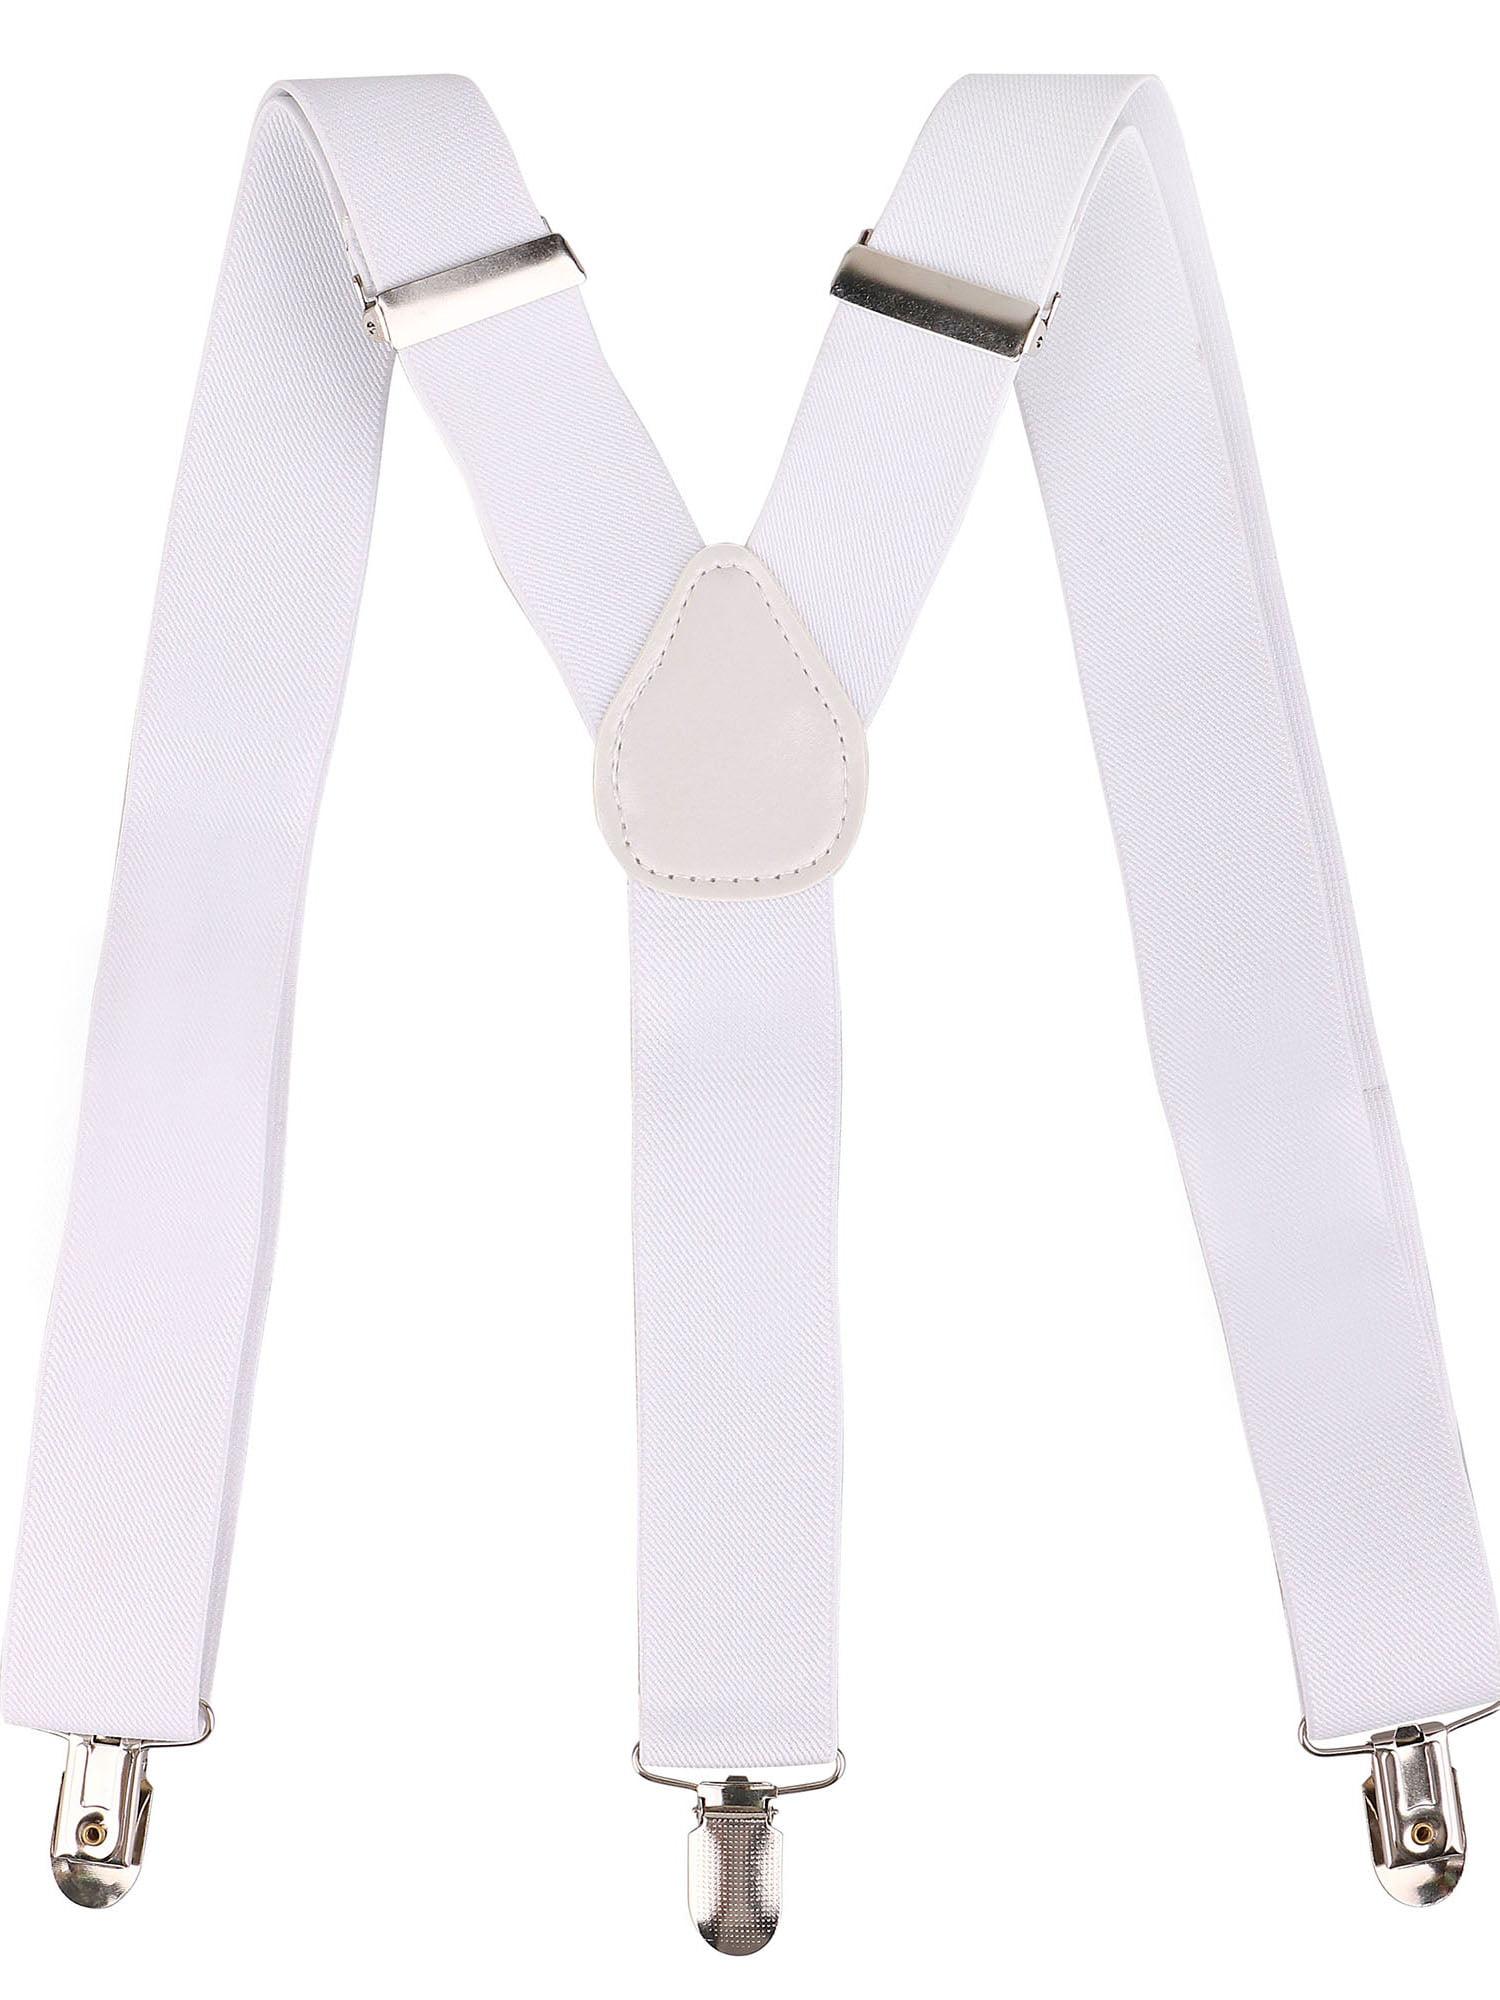 Solid Bow Tie for Tuxedo By Y/&G Handkerchief Cufflinks VS1014-2XL Mens Dress Vest Pink Paisleys Formal Vest for Wedding Gift Set Match Necktie for Men